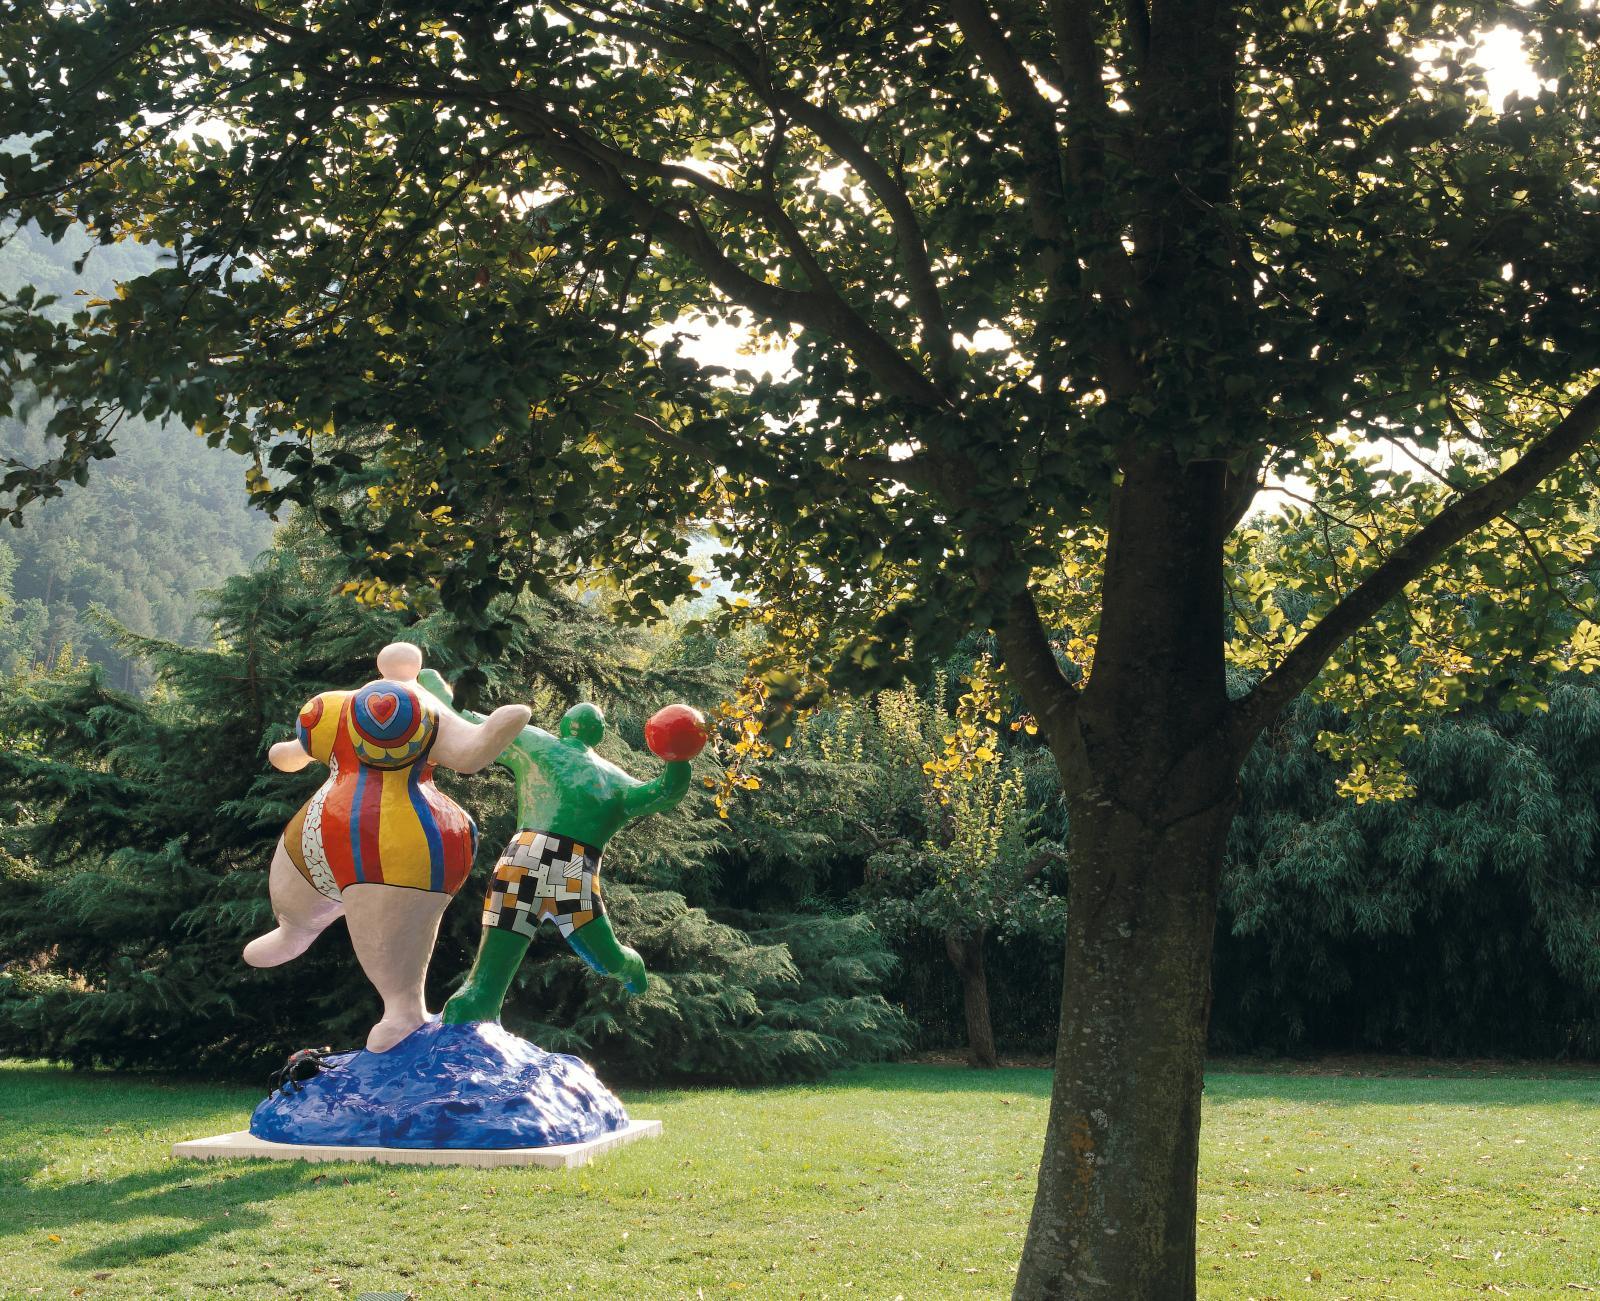 Niki de Saint Phalle, Les Baigneuses. © Michel Darbellay